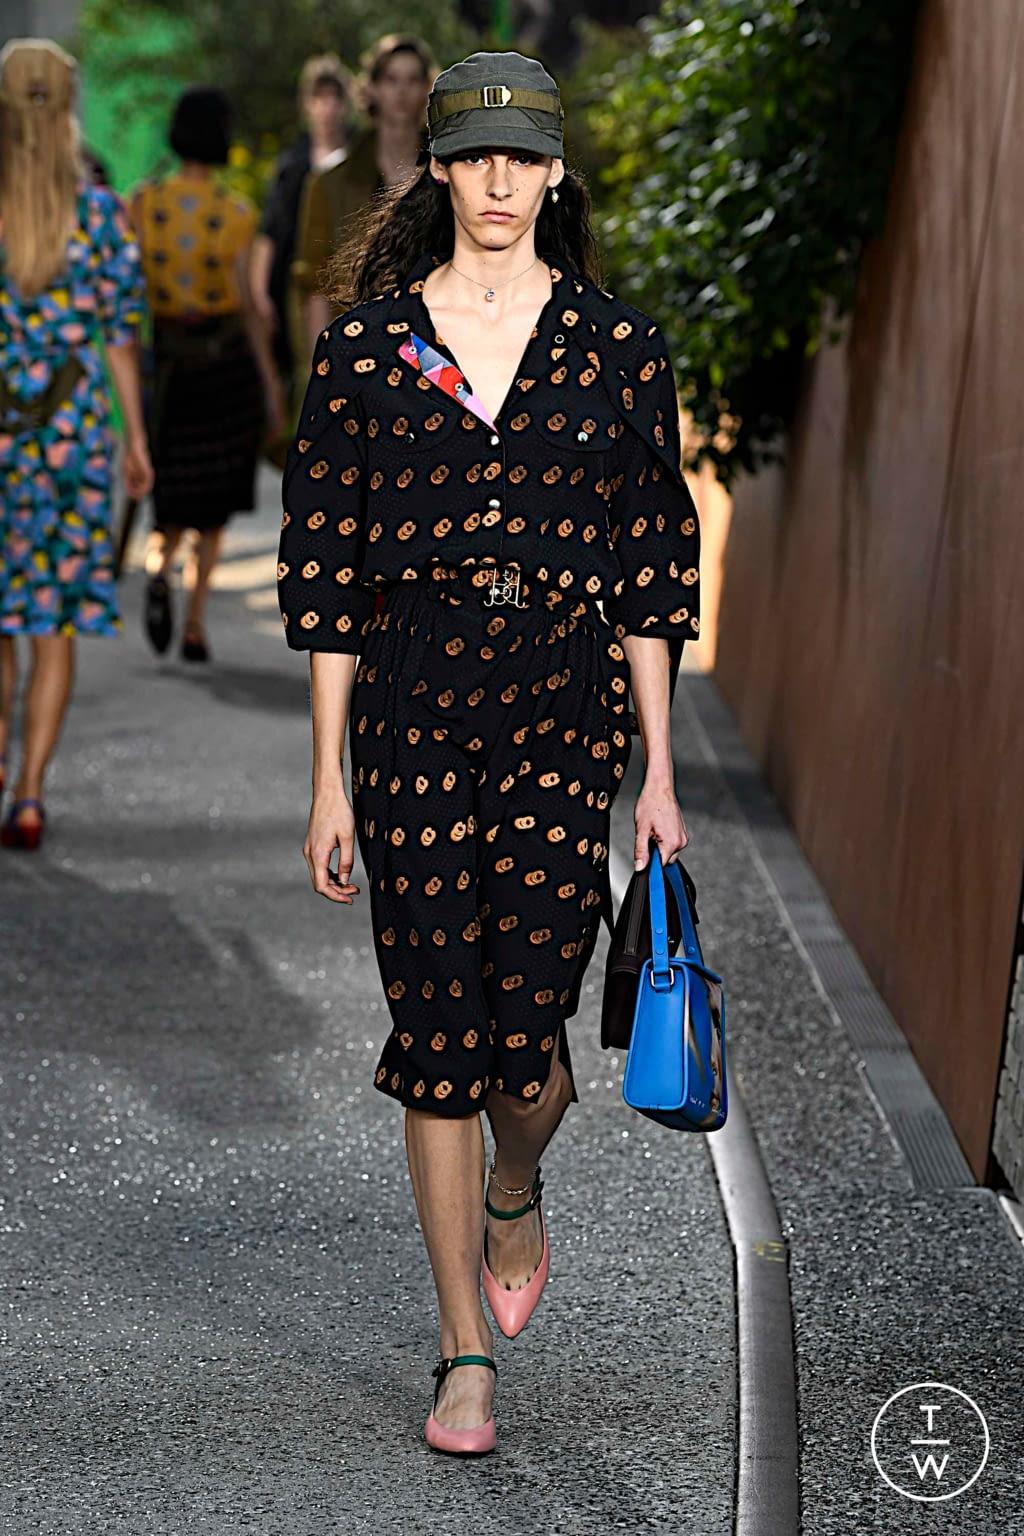 Fashion Week New York Spring/Summer 2020 look 38 de la collection Coach 1941 womenswear